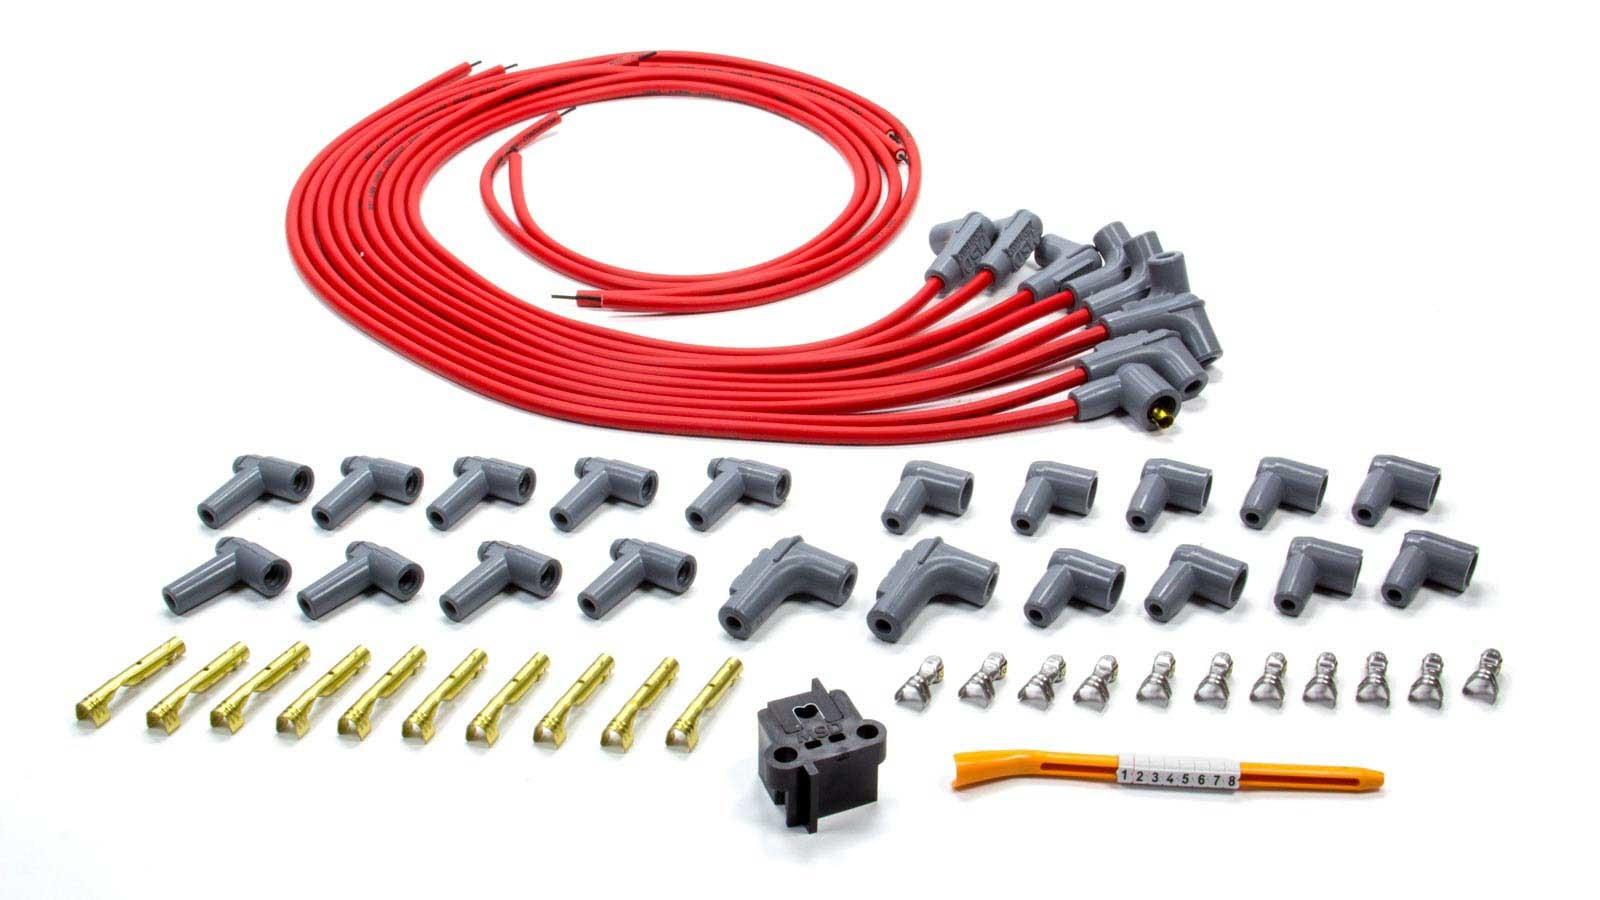 8 Cyl. Wire Set